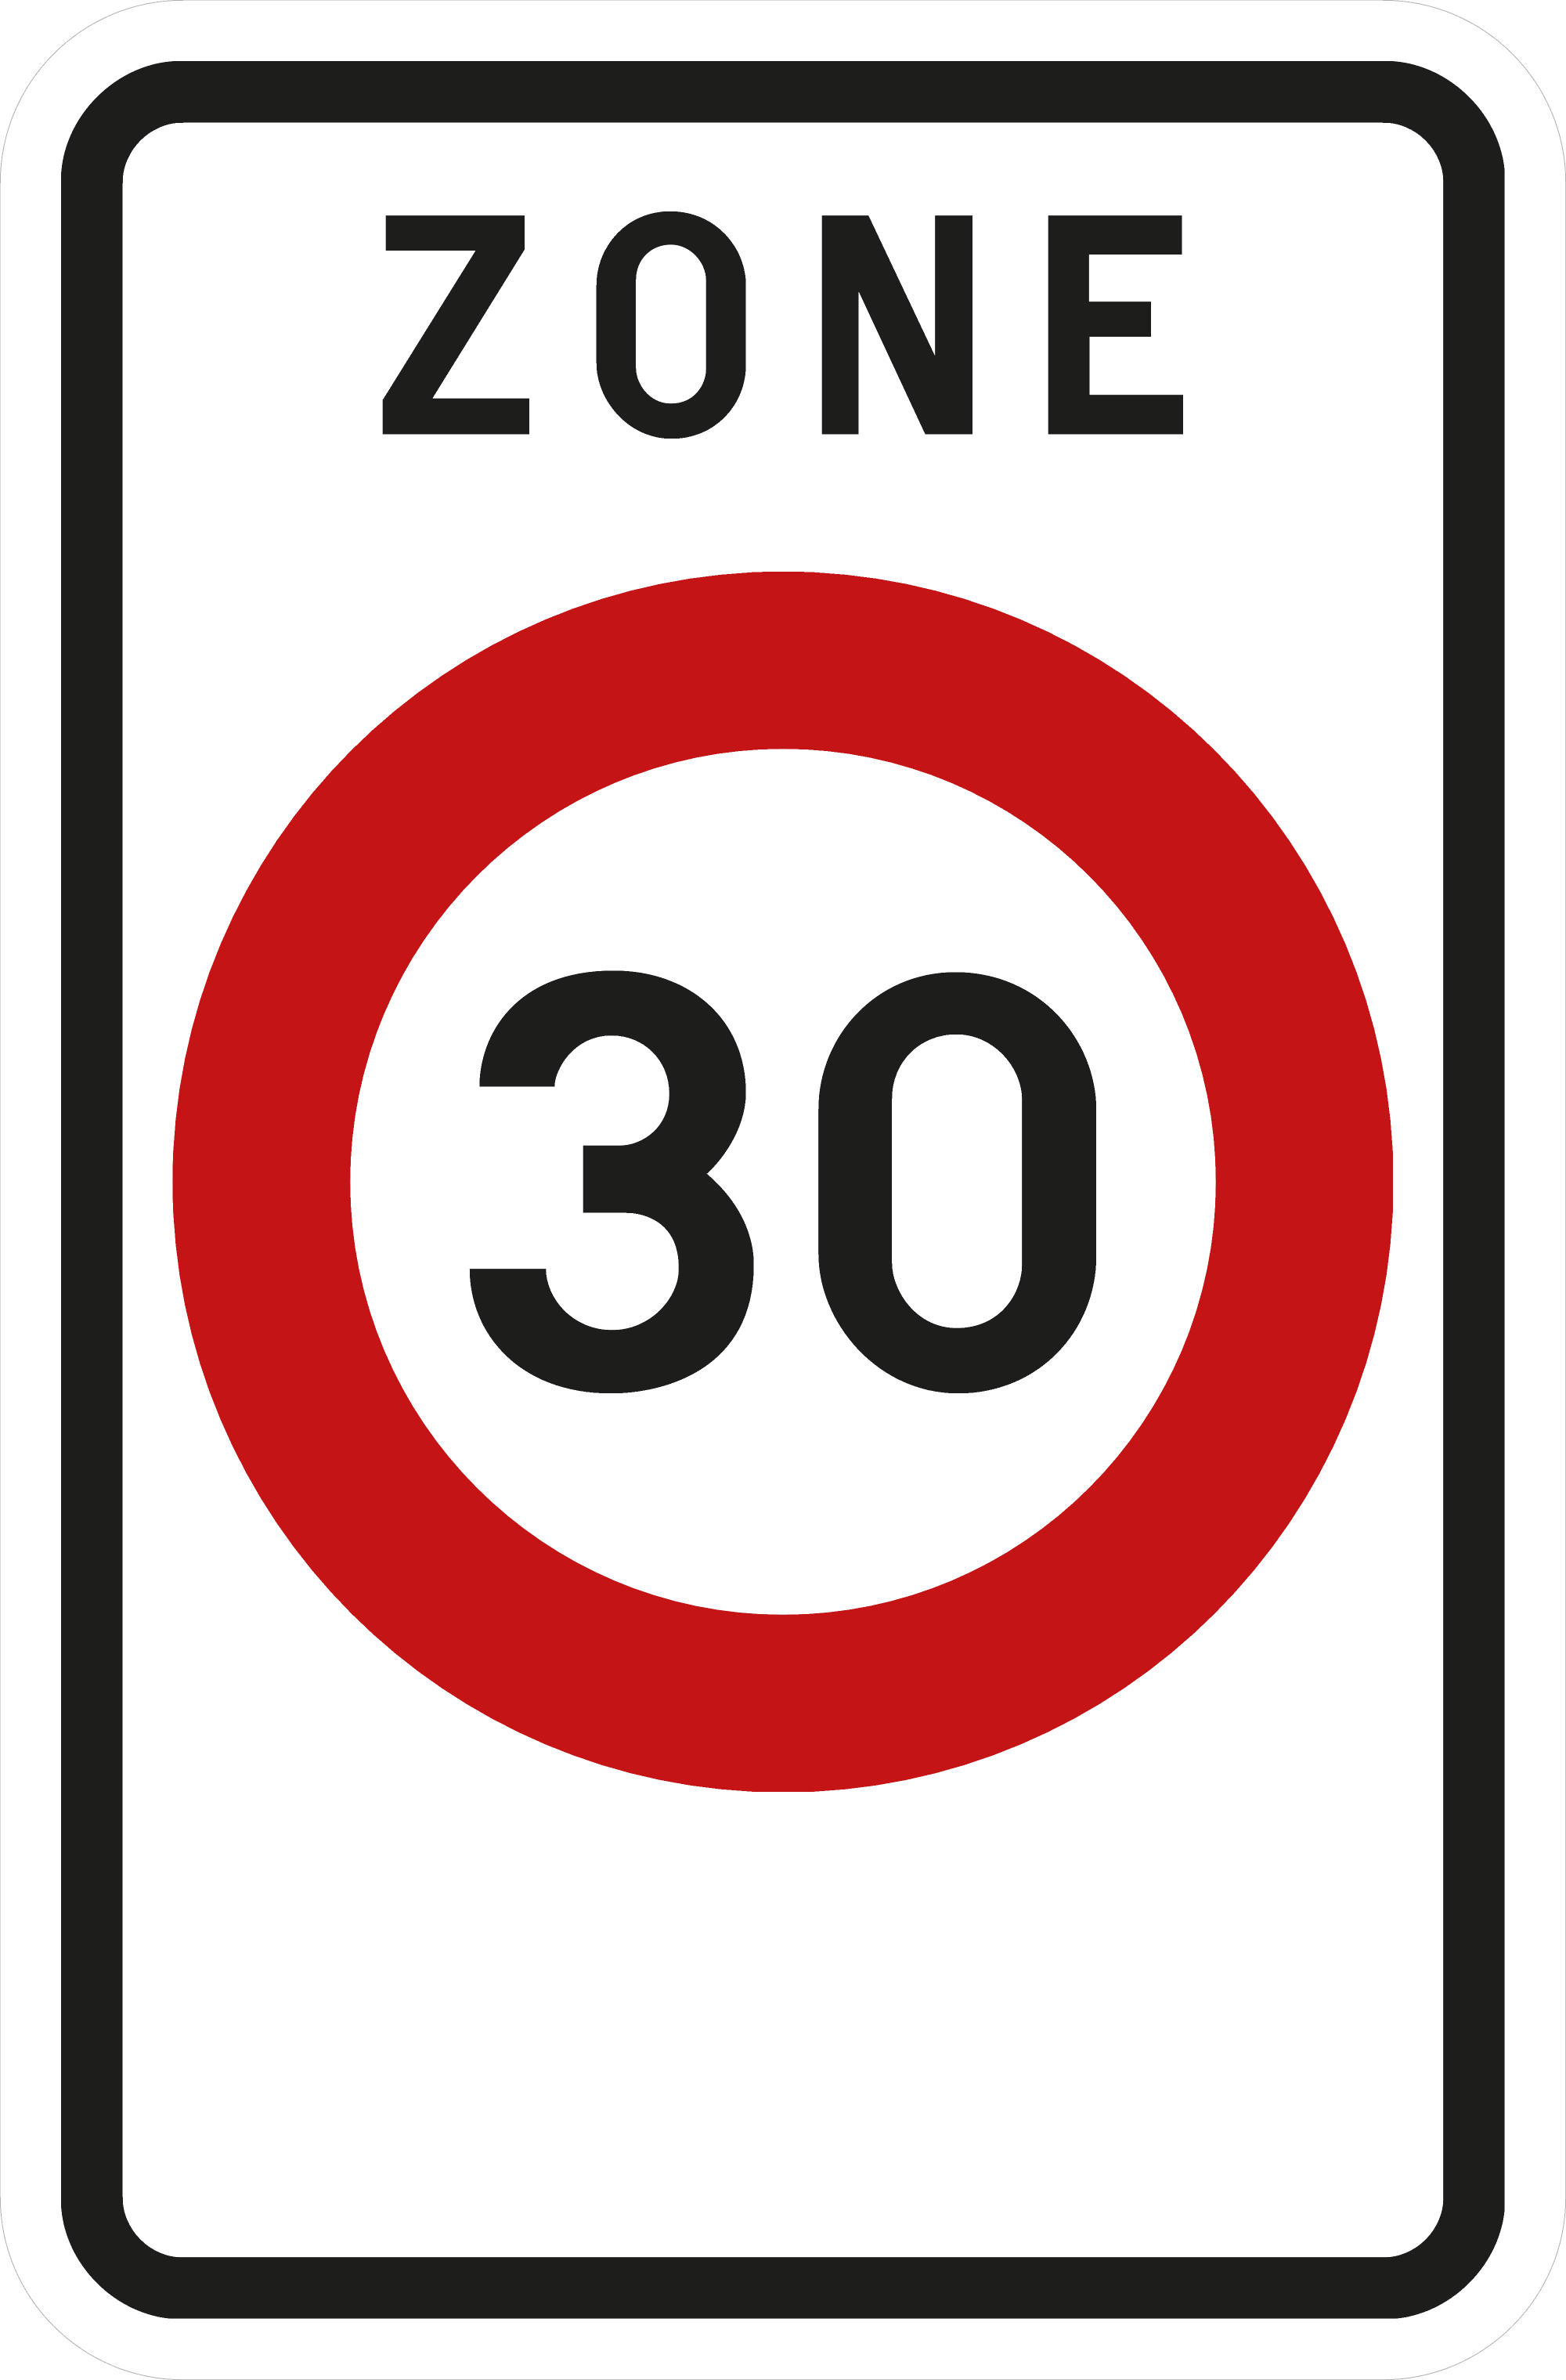 Signface - F4a - klasse  I - 400/600 mm